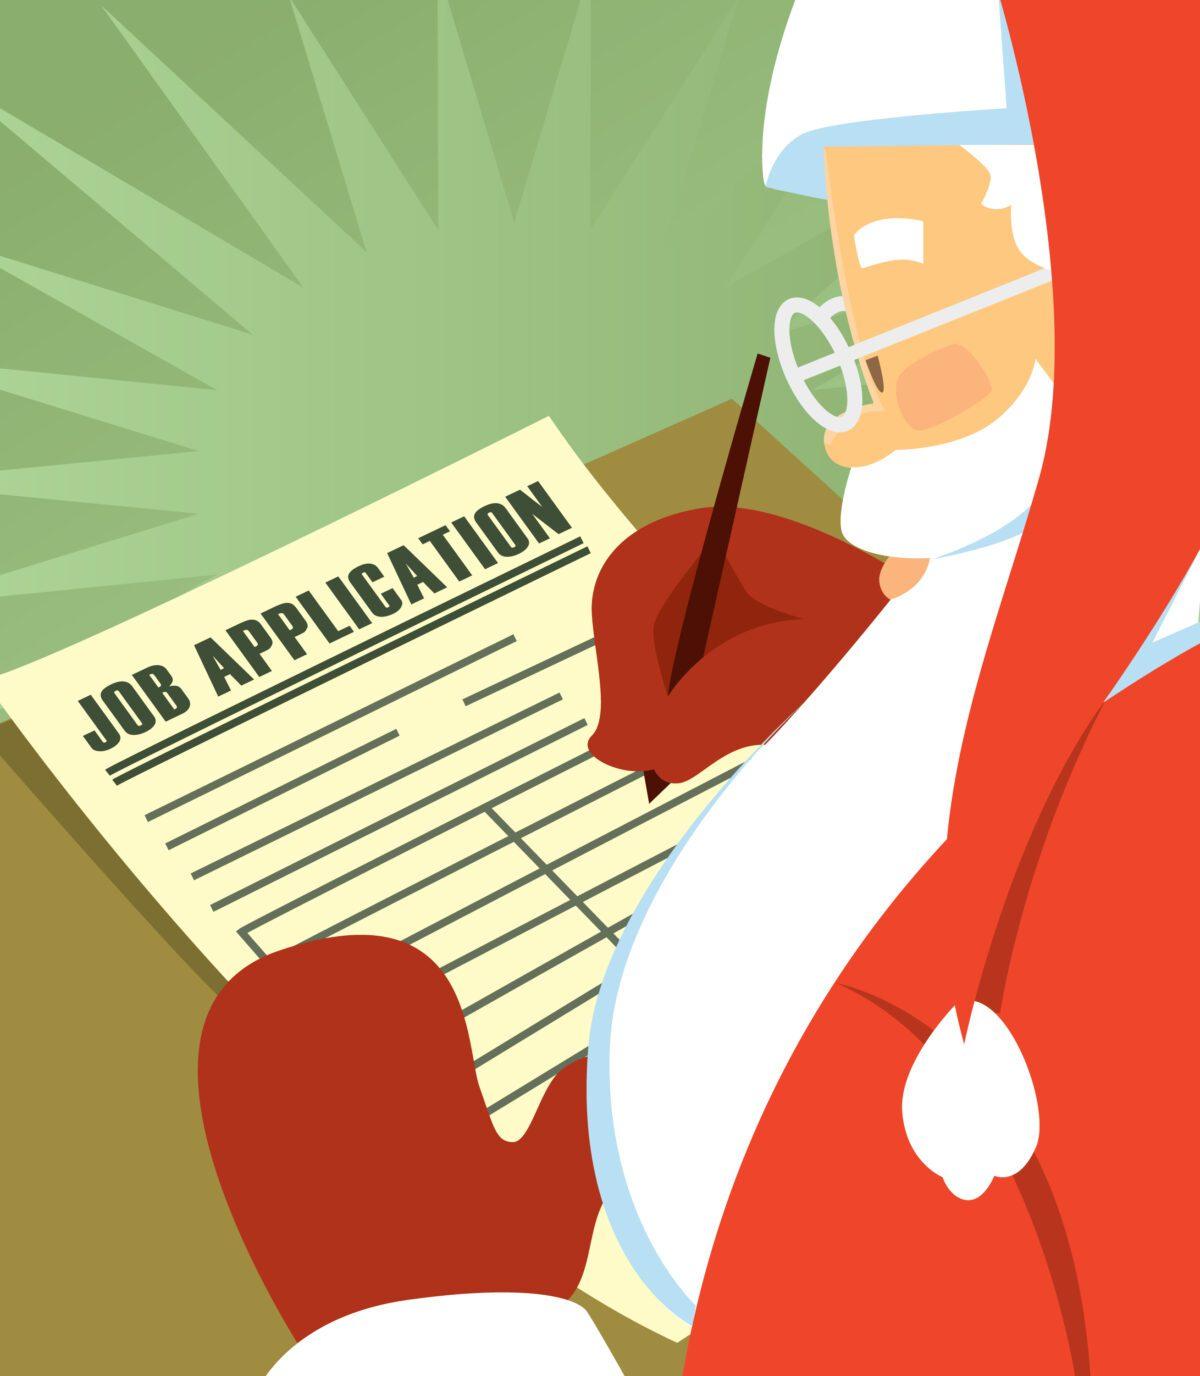 Santa Claus filling out a job application during the holiday season.